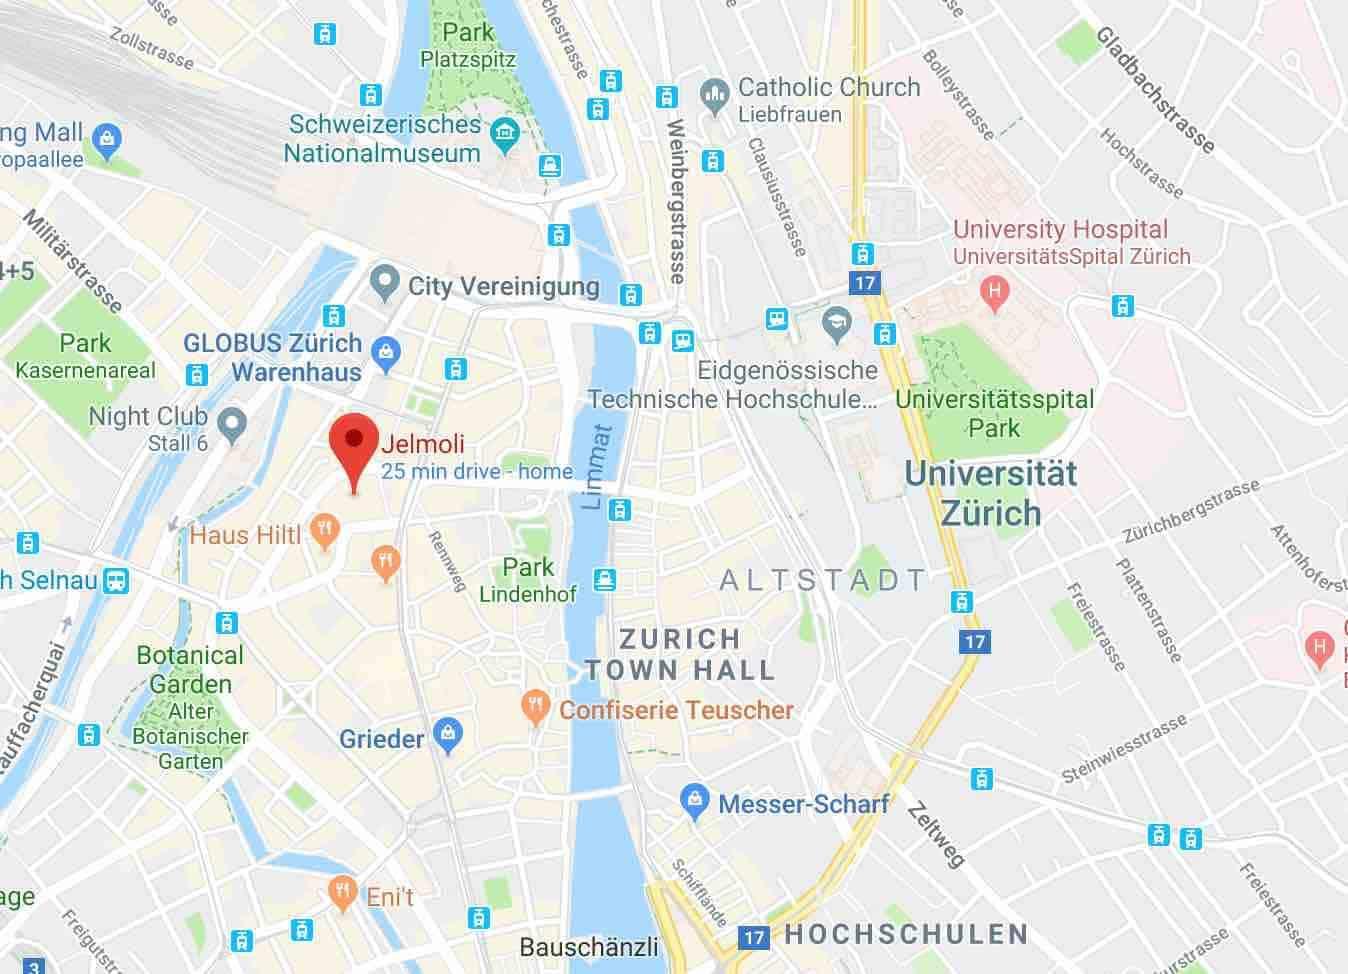 Google Map of Jelmoli Zurich - NewinZurich - Your Guide To Living in on basel map, wittenberg germany map, innsbruck map, swiss alps map, switzerland map, bern map, seine river map, lucerne map, danube river map, munich map, novosibirsk map, rhone river map, geneva map, rhine river map, mediterranean sea map, the hague map, budapest map, kiev map, frankfurt map, minsk map,